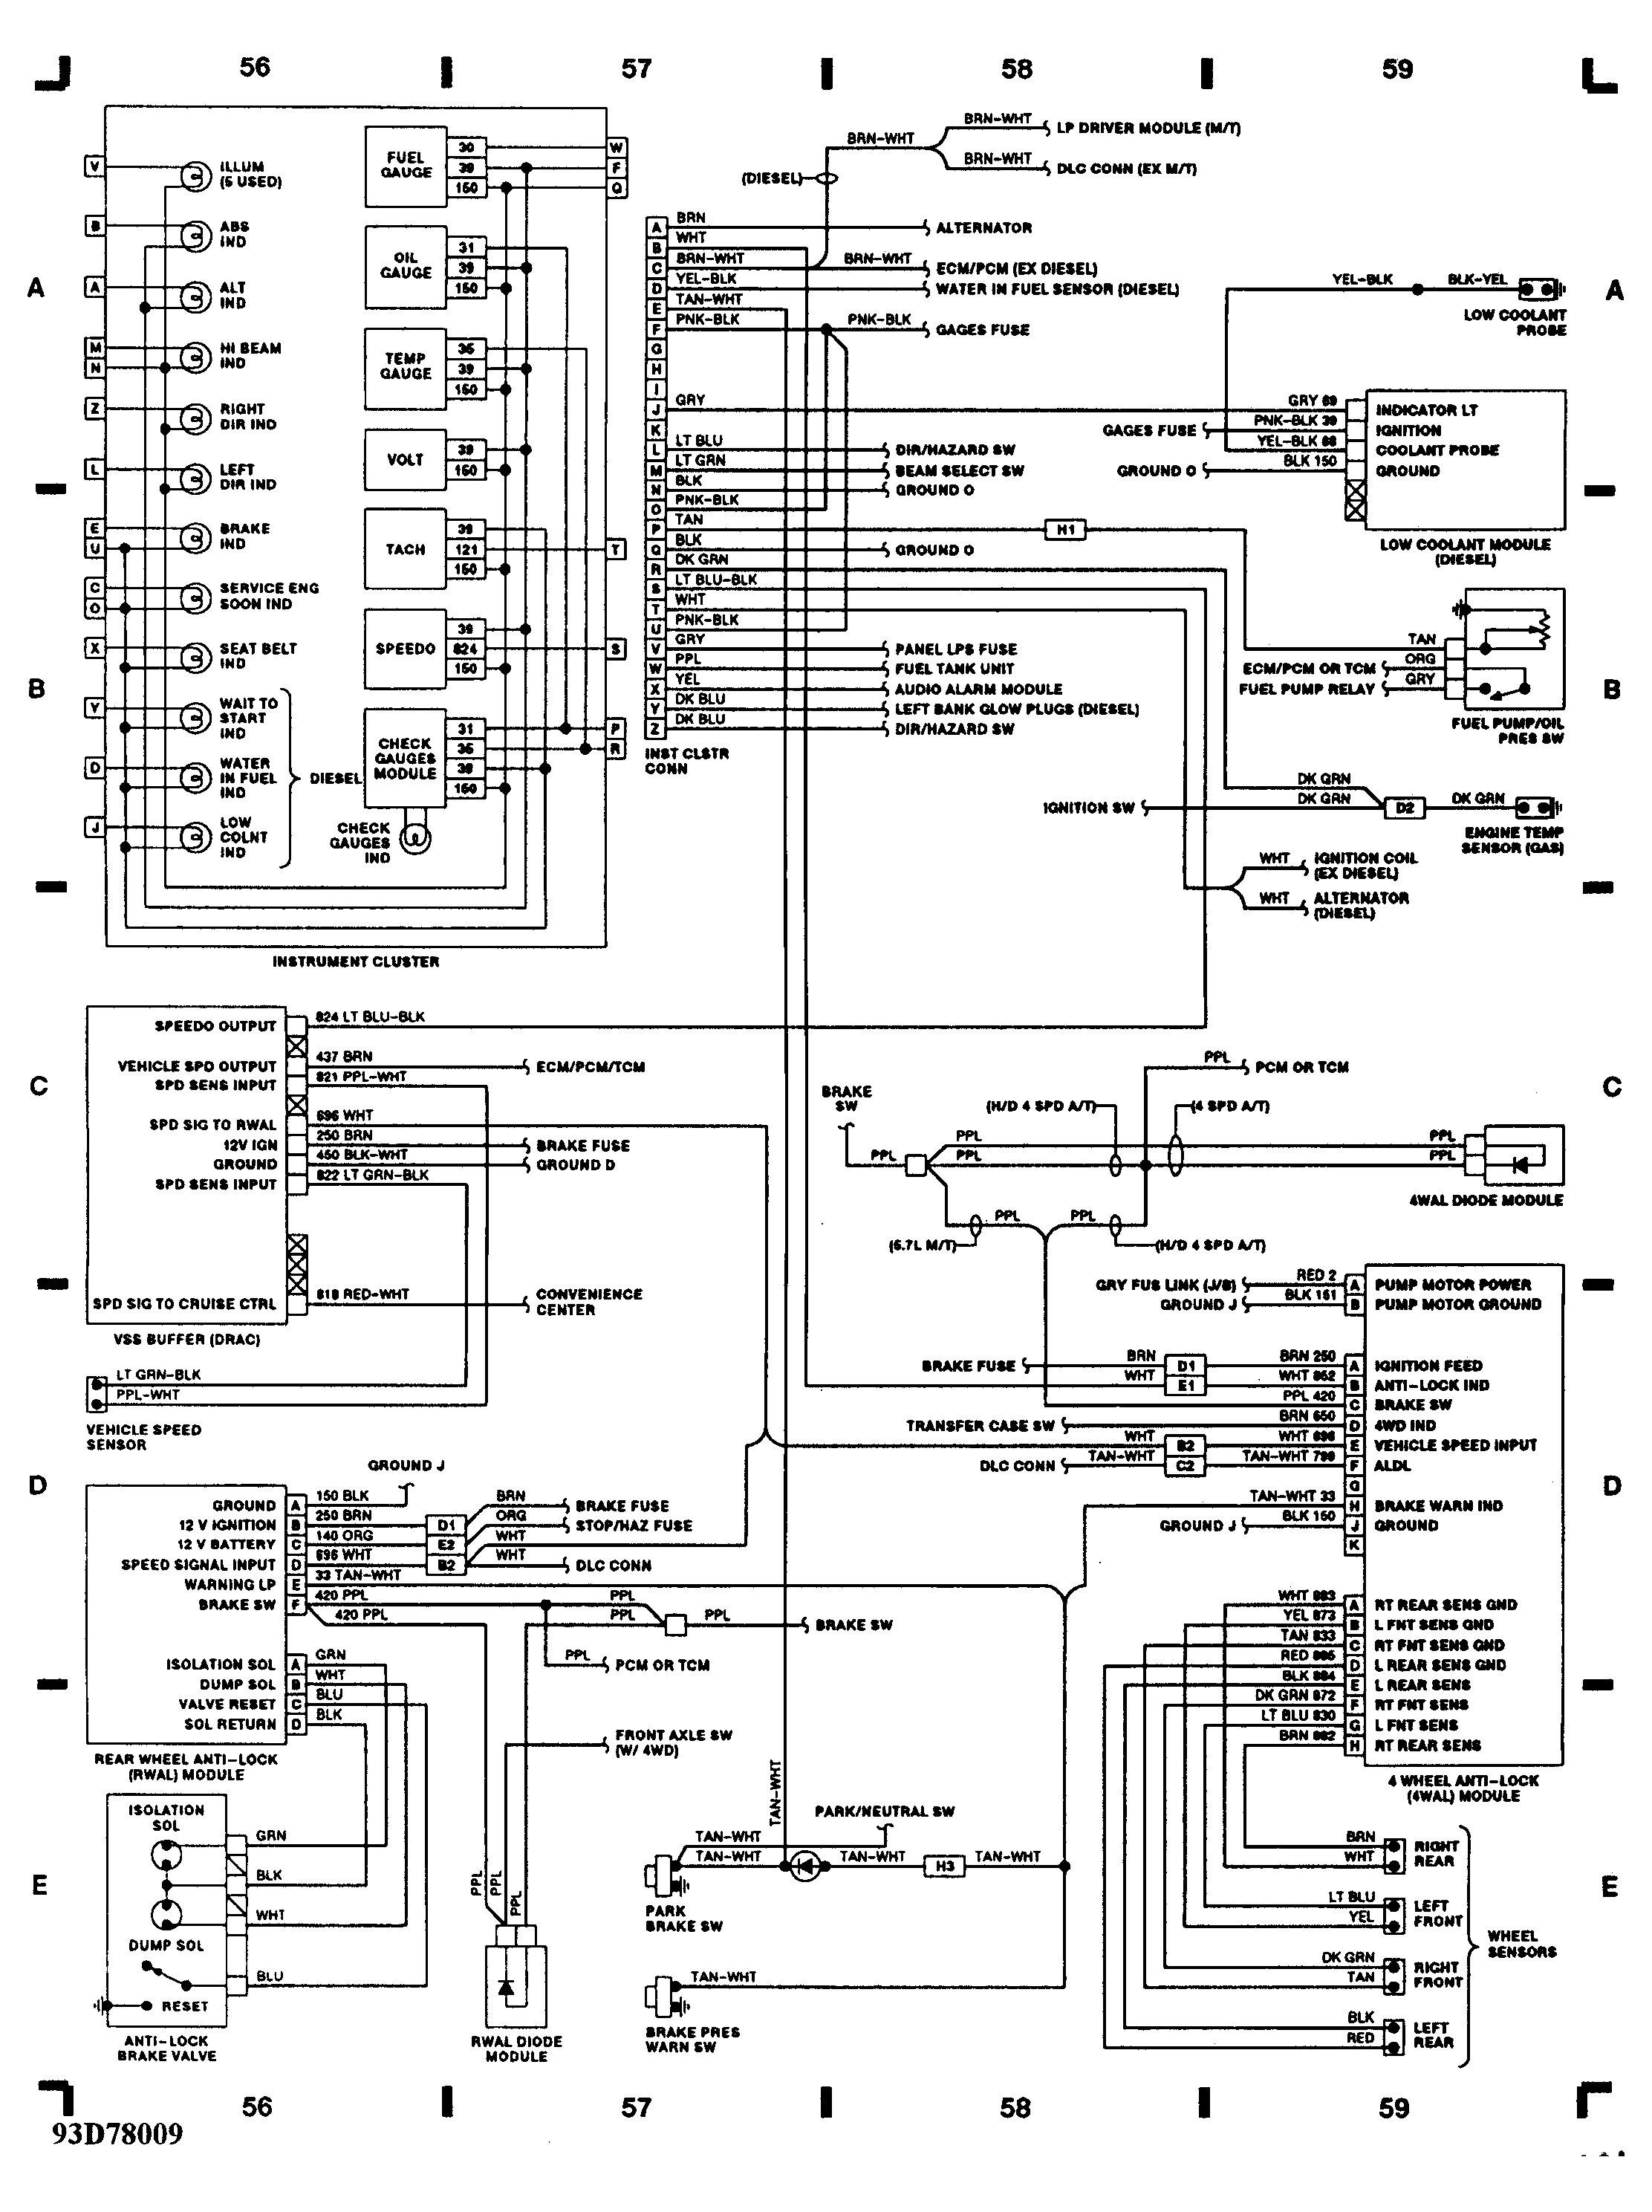 caterpillar d1256 wiring diagram wiring diagrams u2022 rh wiringdiagramblog today Cat 3126 ECM Wiring Diagram Cat 5 Wiring Color Diagrams